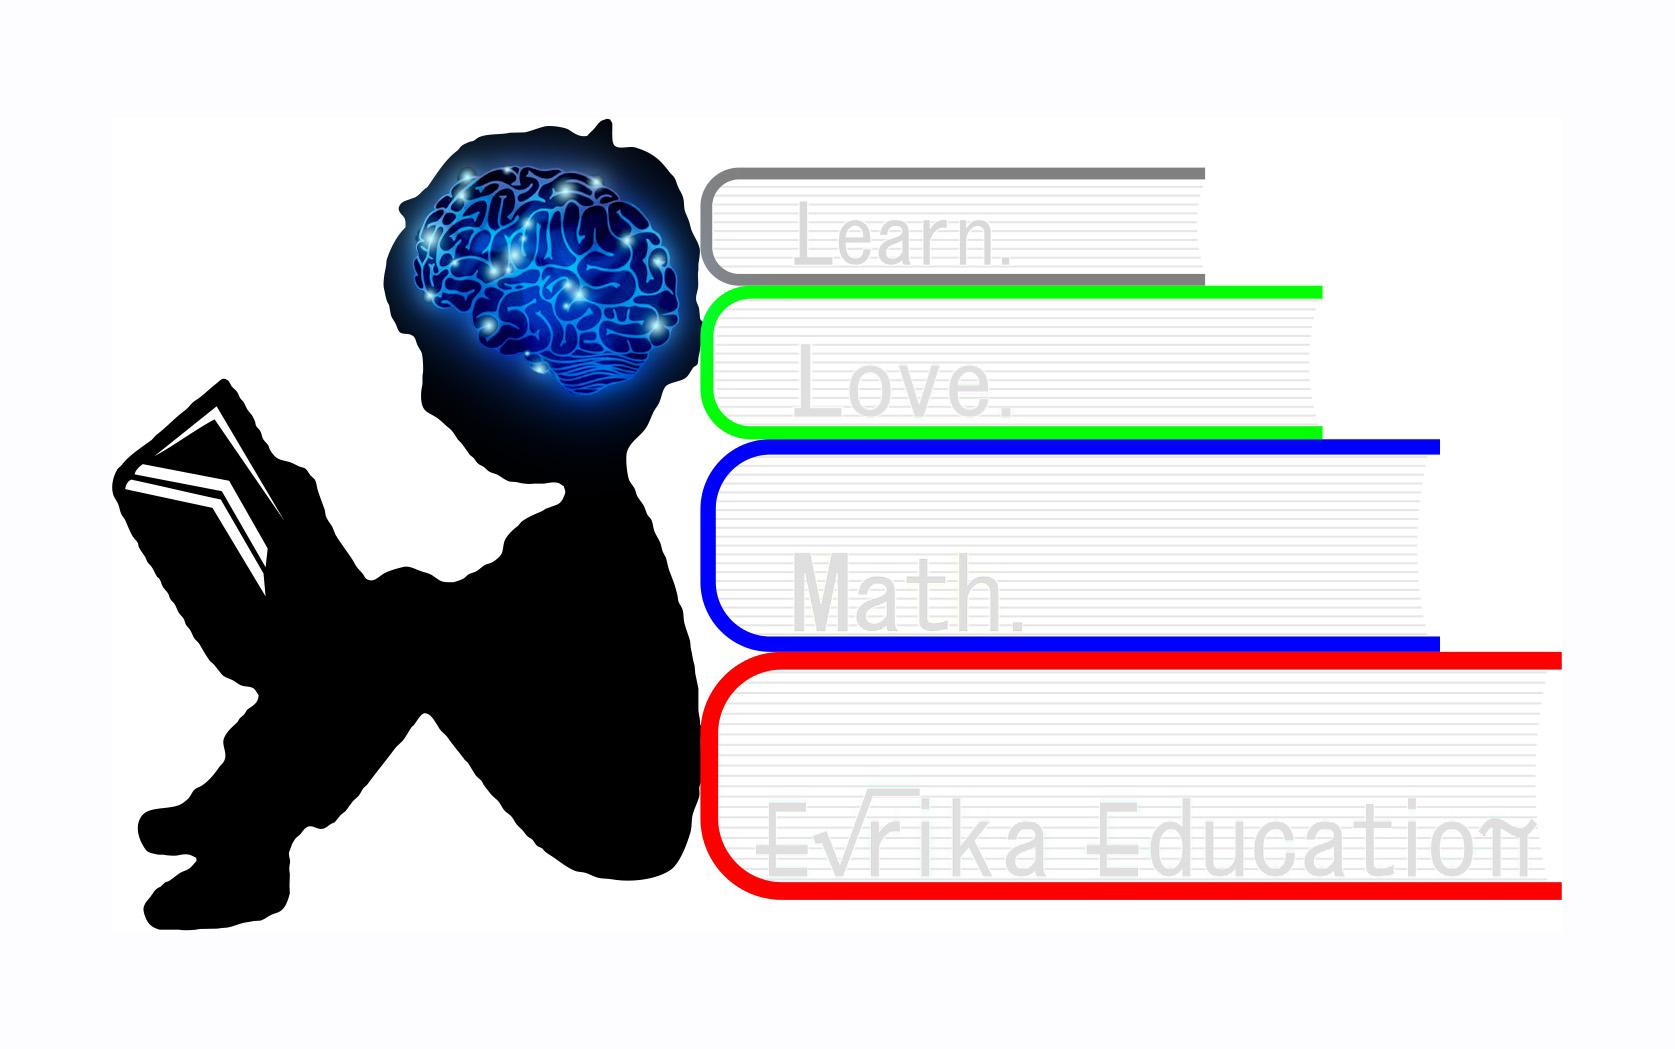 evrika education cursuri online